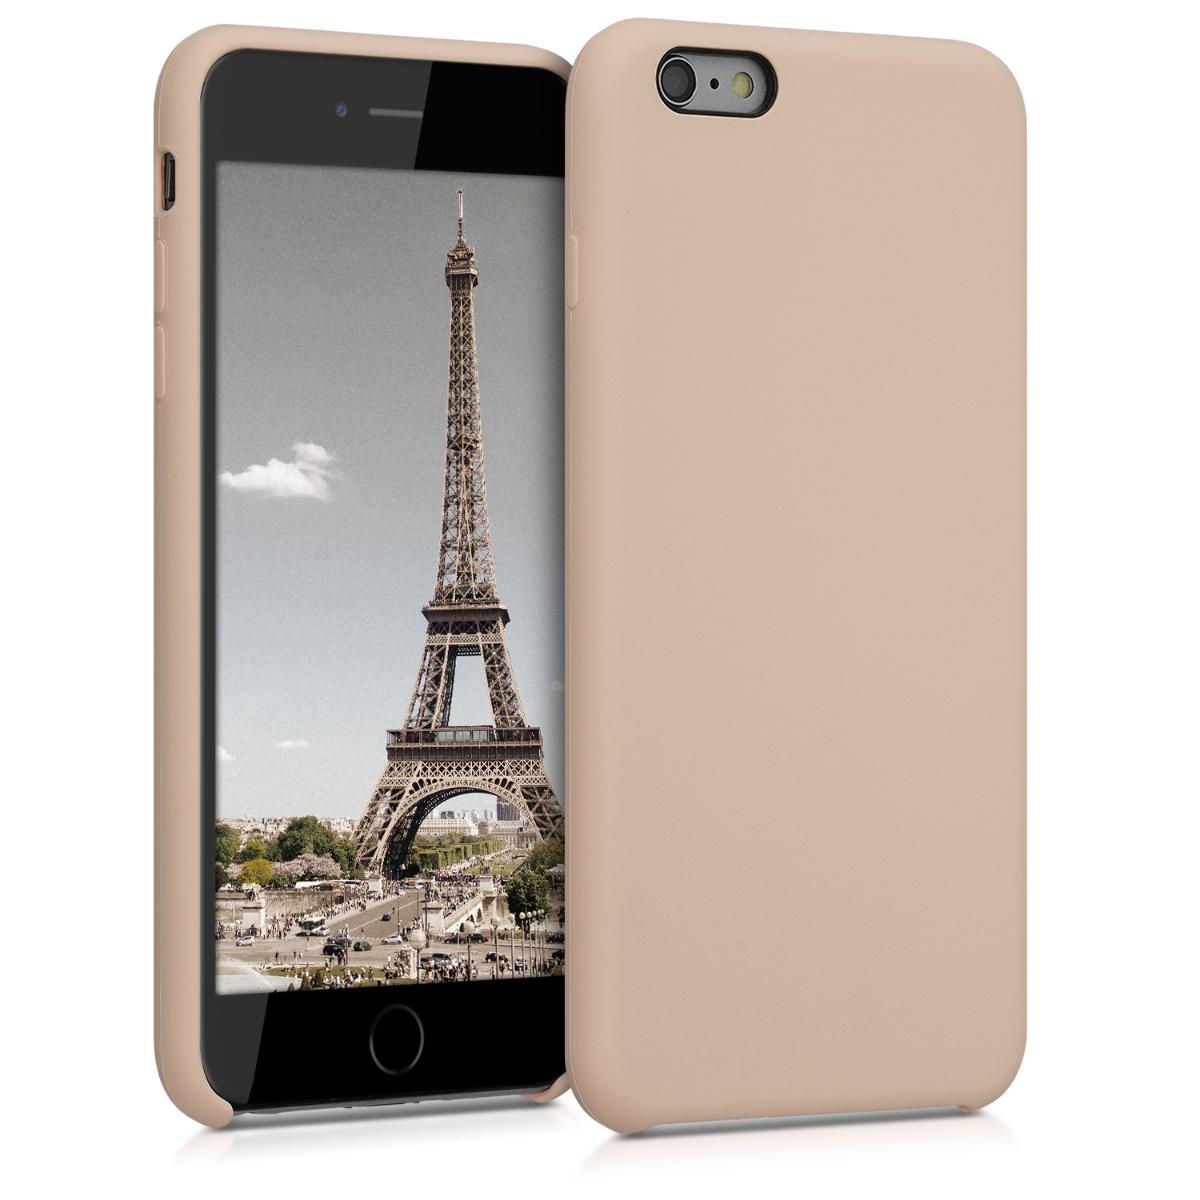 Kvalitní silikonové TPU pouzdro pro Apple iPhone 6 Plus / 6S - Perleť